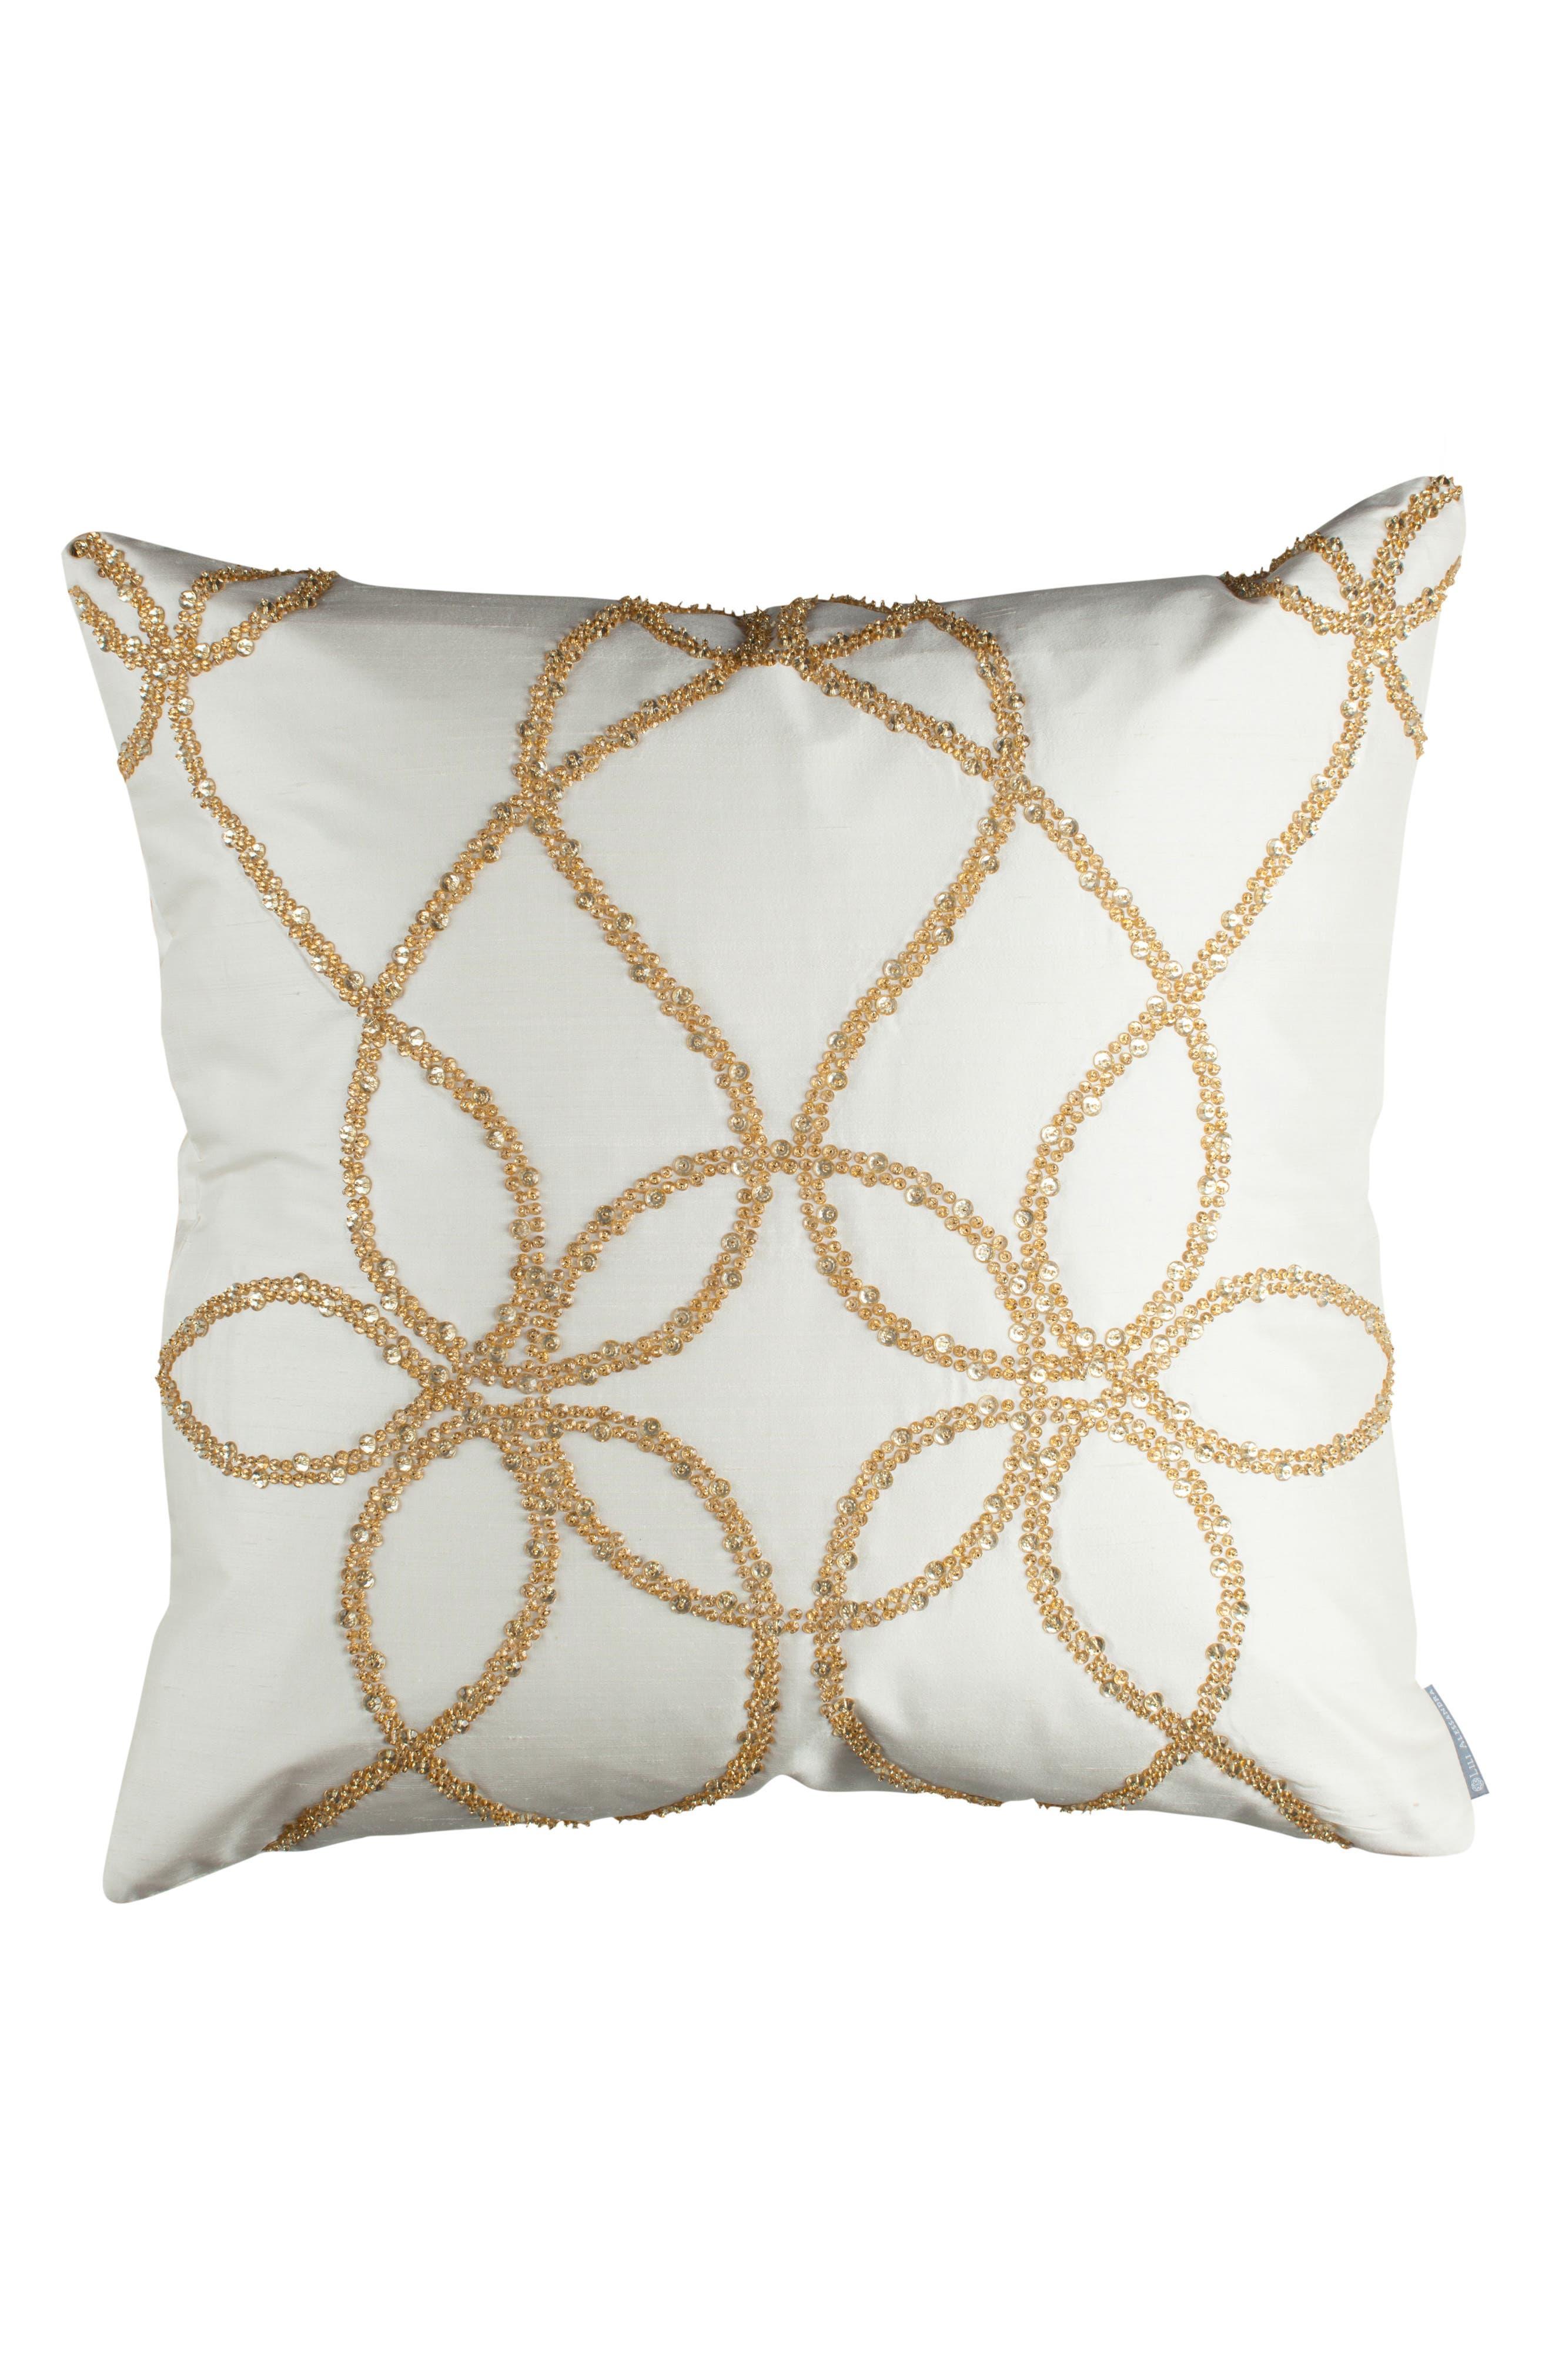 Main Image - Lili Alessandra Silk Accent Pillow